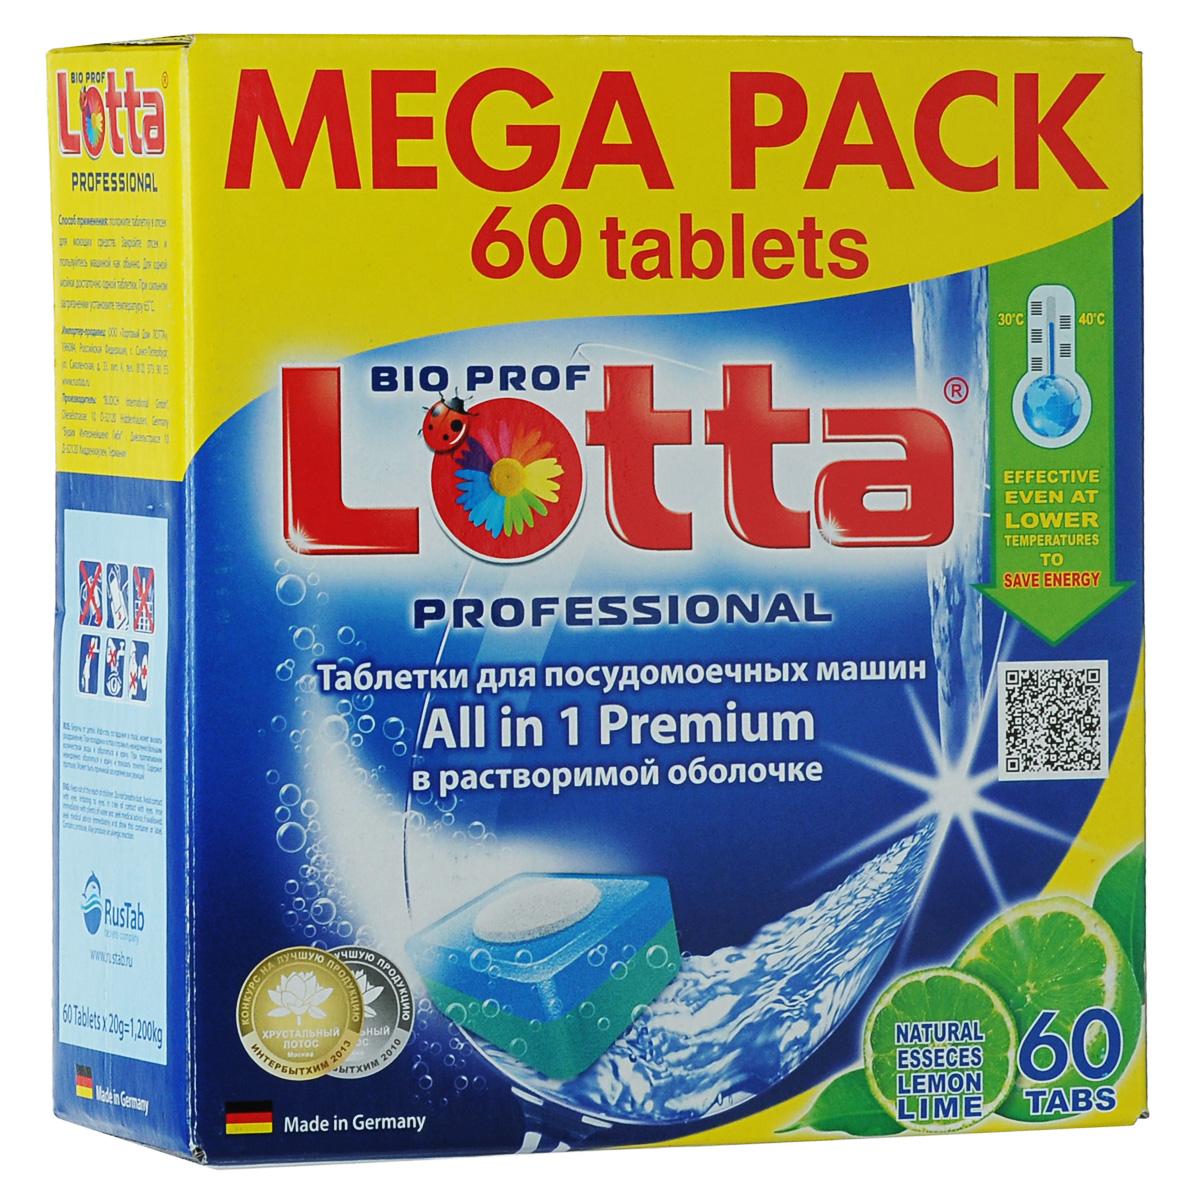 Таблетки для посудомоечных машин Lotta All in 1 Premium, с ароматом лайма, 60 таблеток ринфолтил 60 таблетки